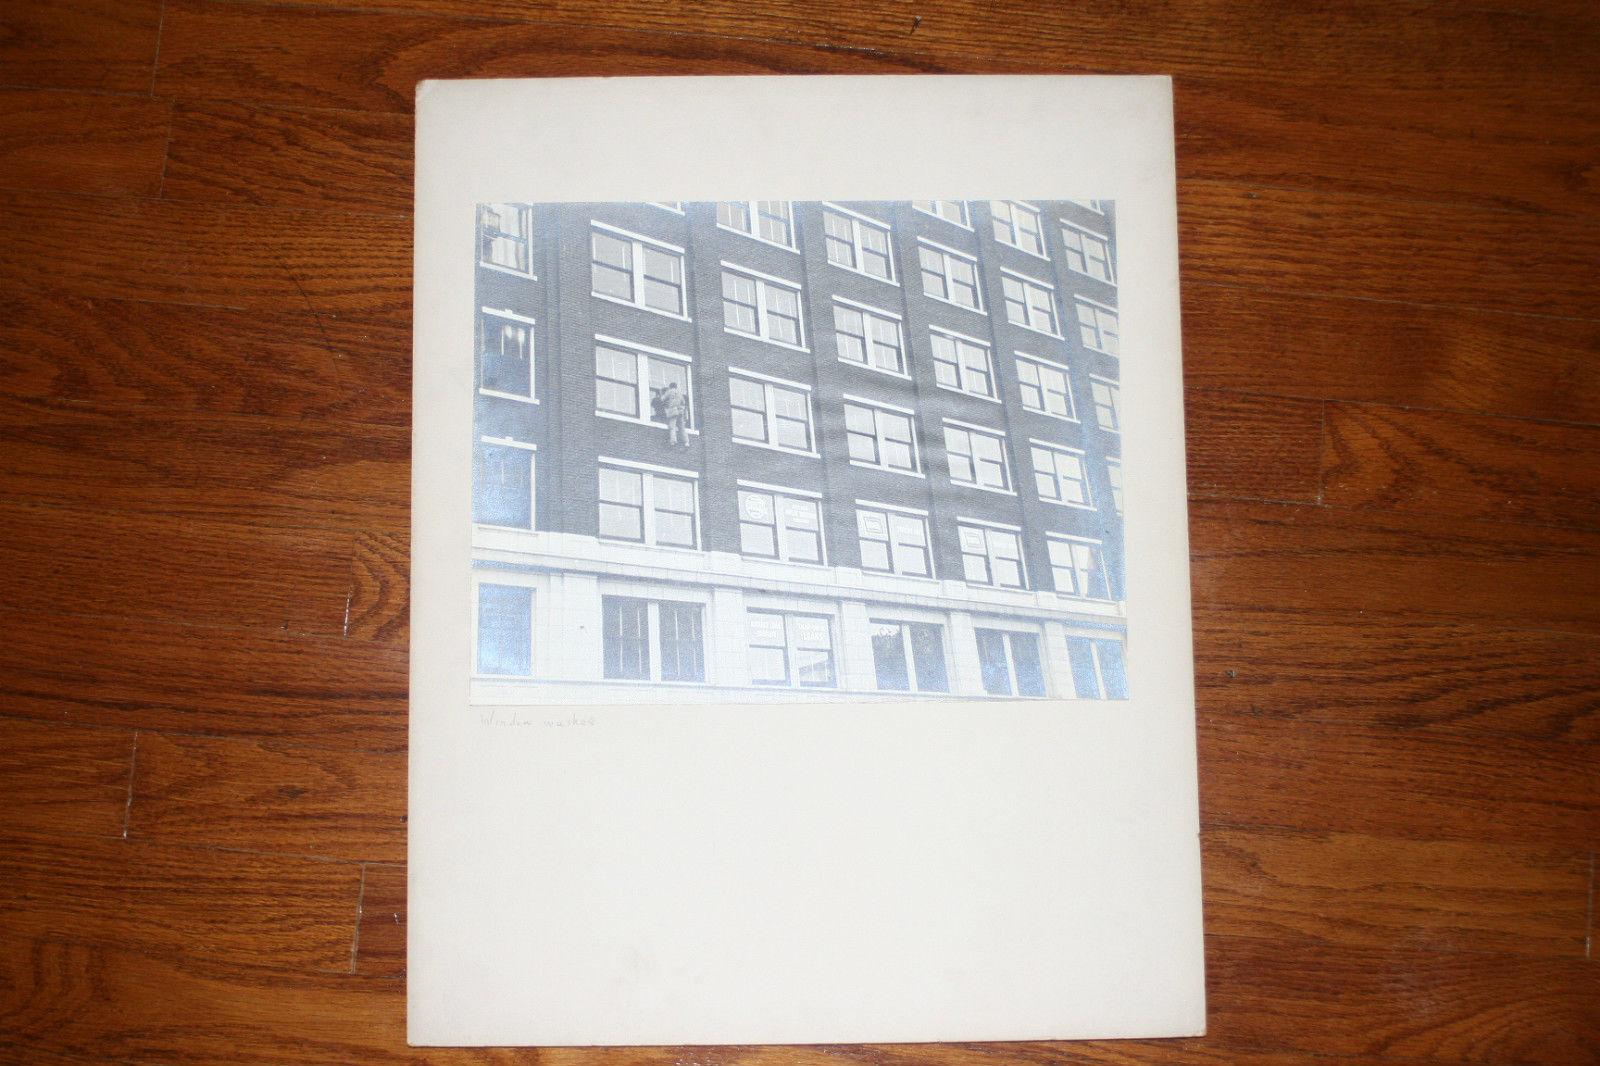 BLACK & WHITE SILVER GELATIN PHOTOGRAPH TITLED WINDOW WASHER image 2